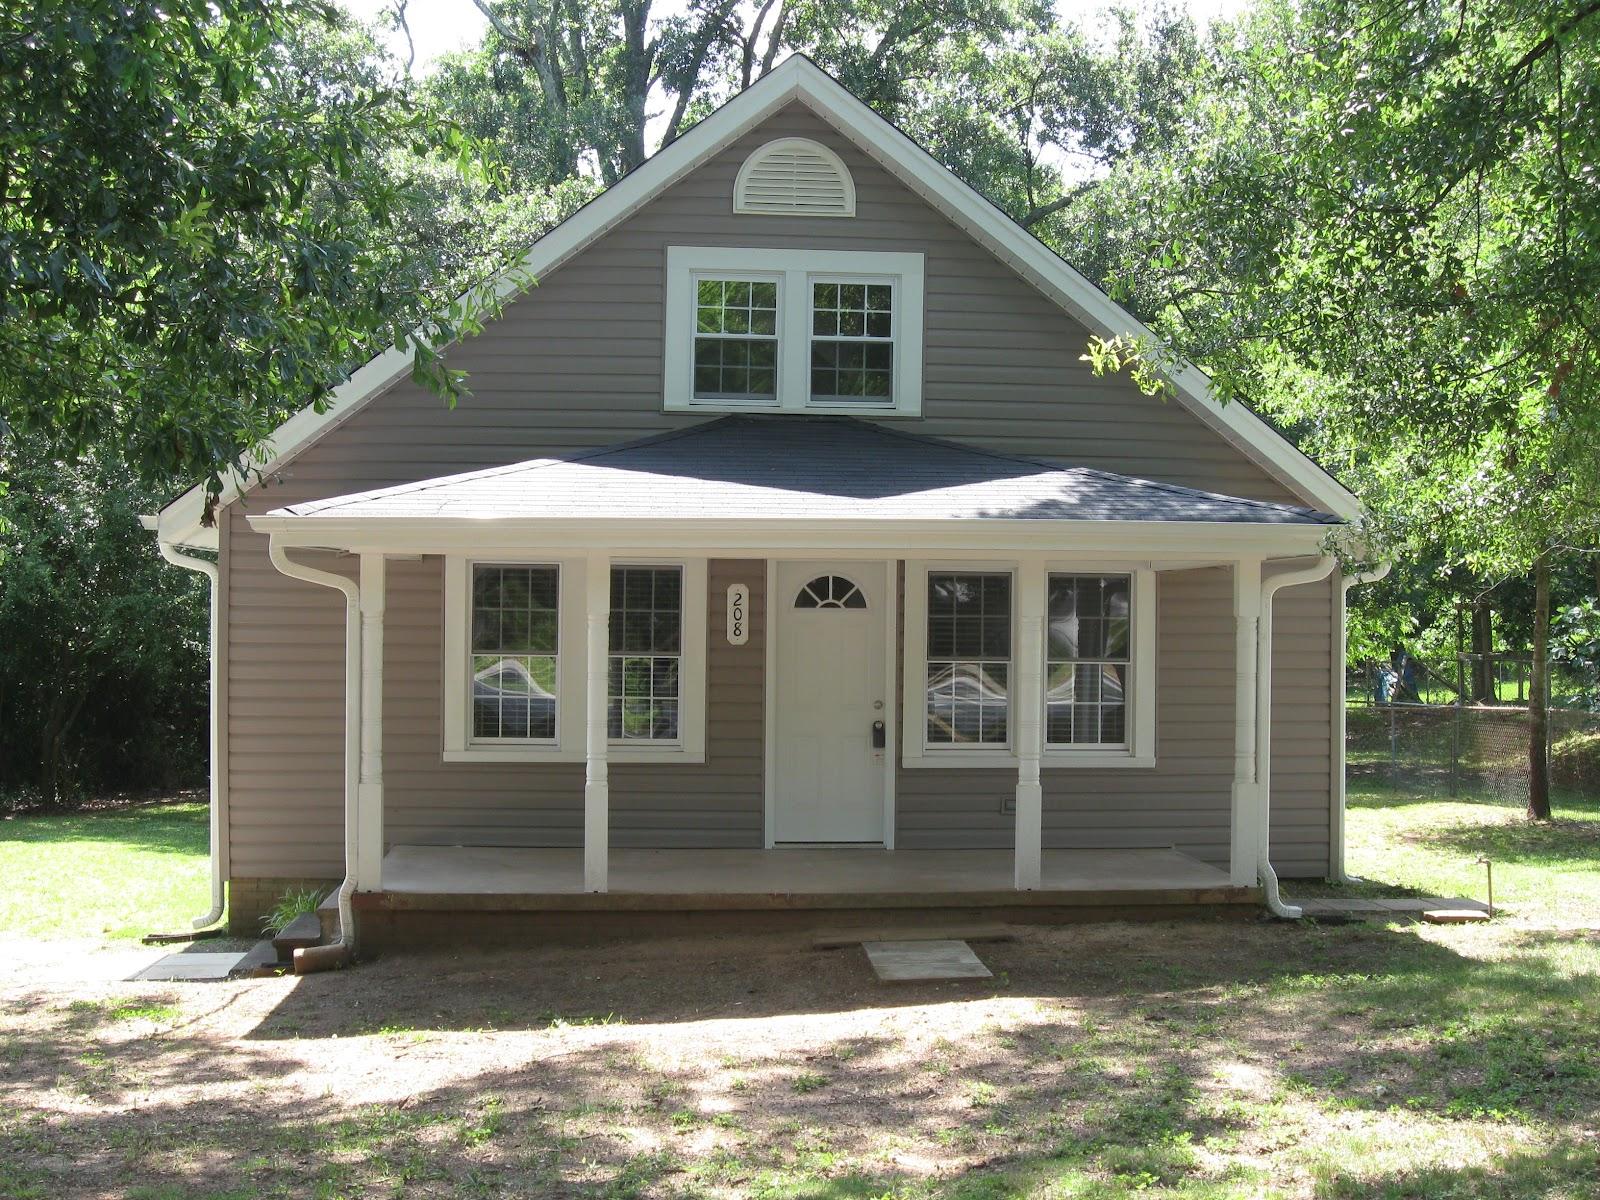 Sherrod house nalley street the final product - White house gray trim ...